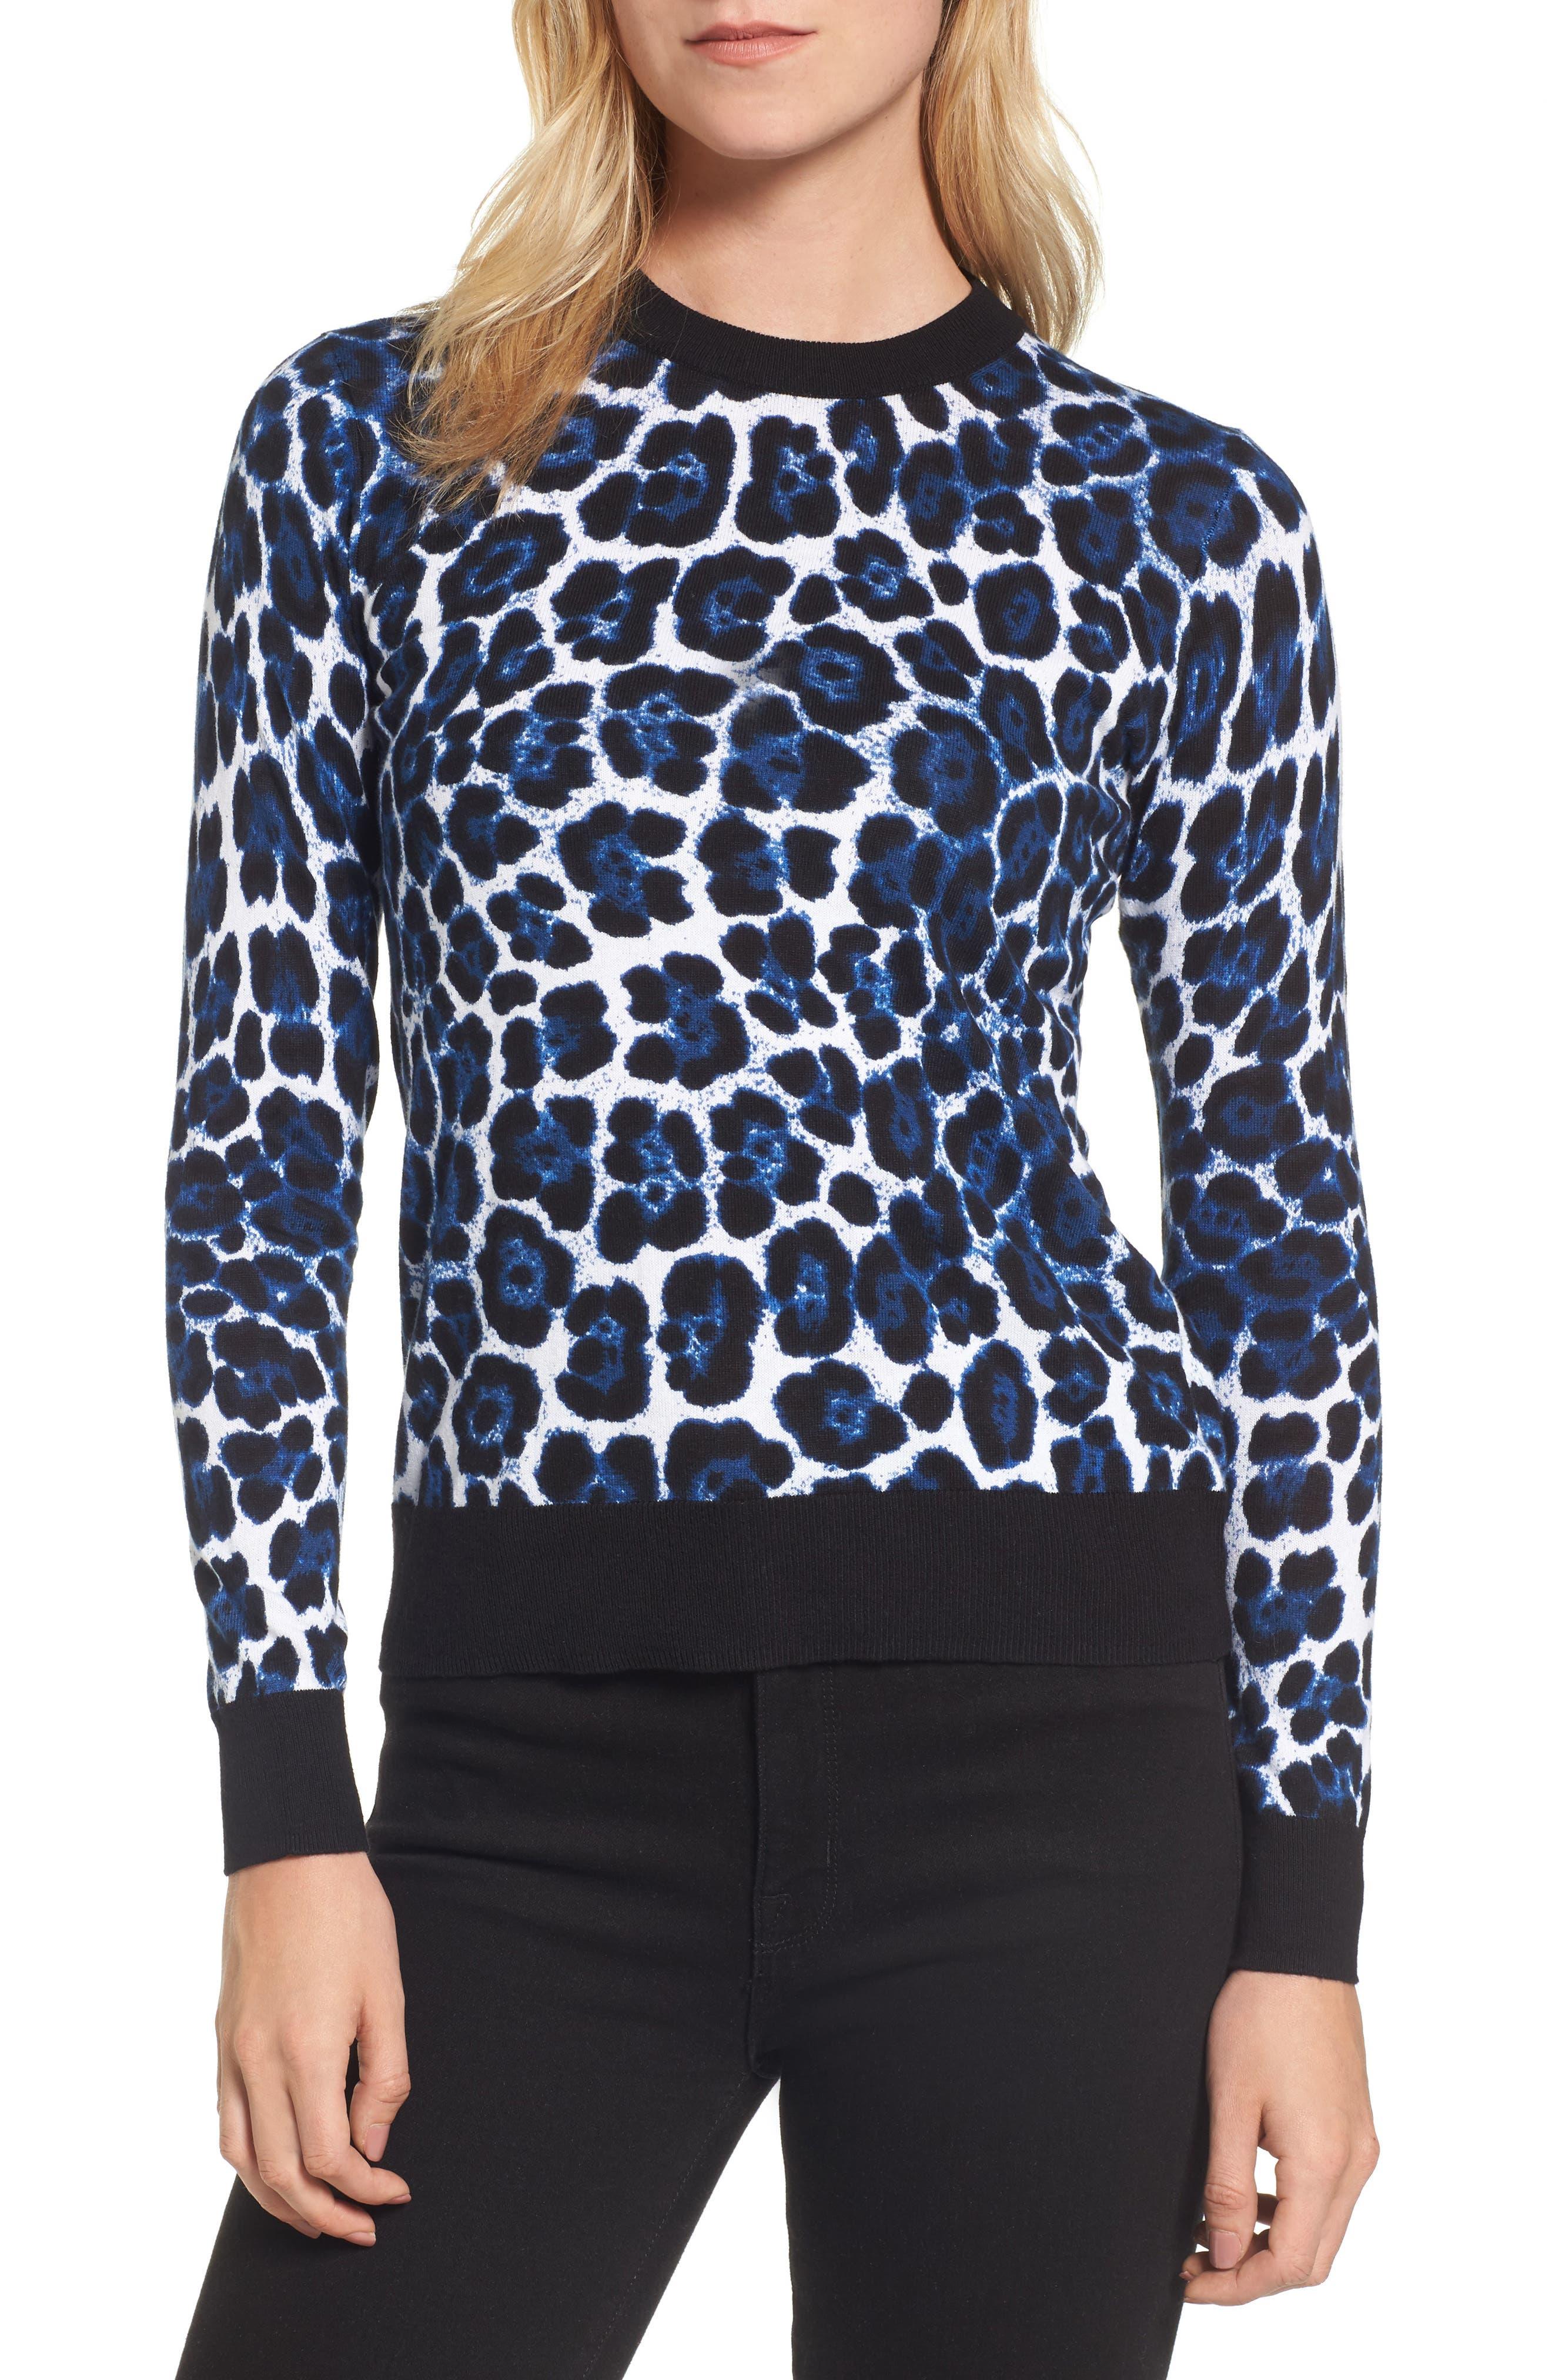 Cheetah Print Sweater,                             Main thumbnail 1, color,                             403